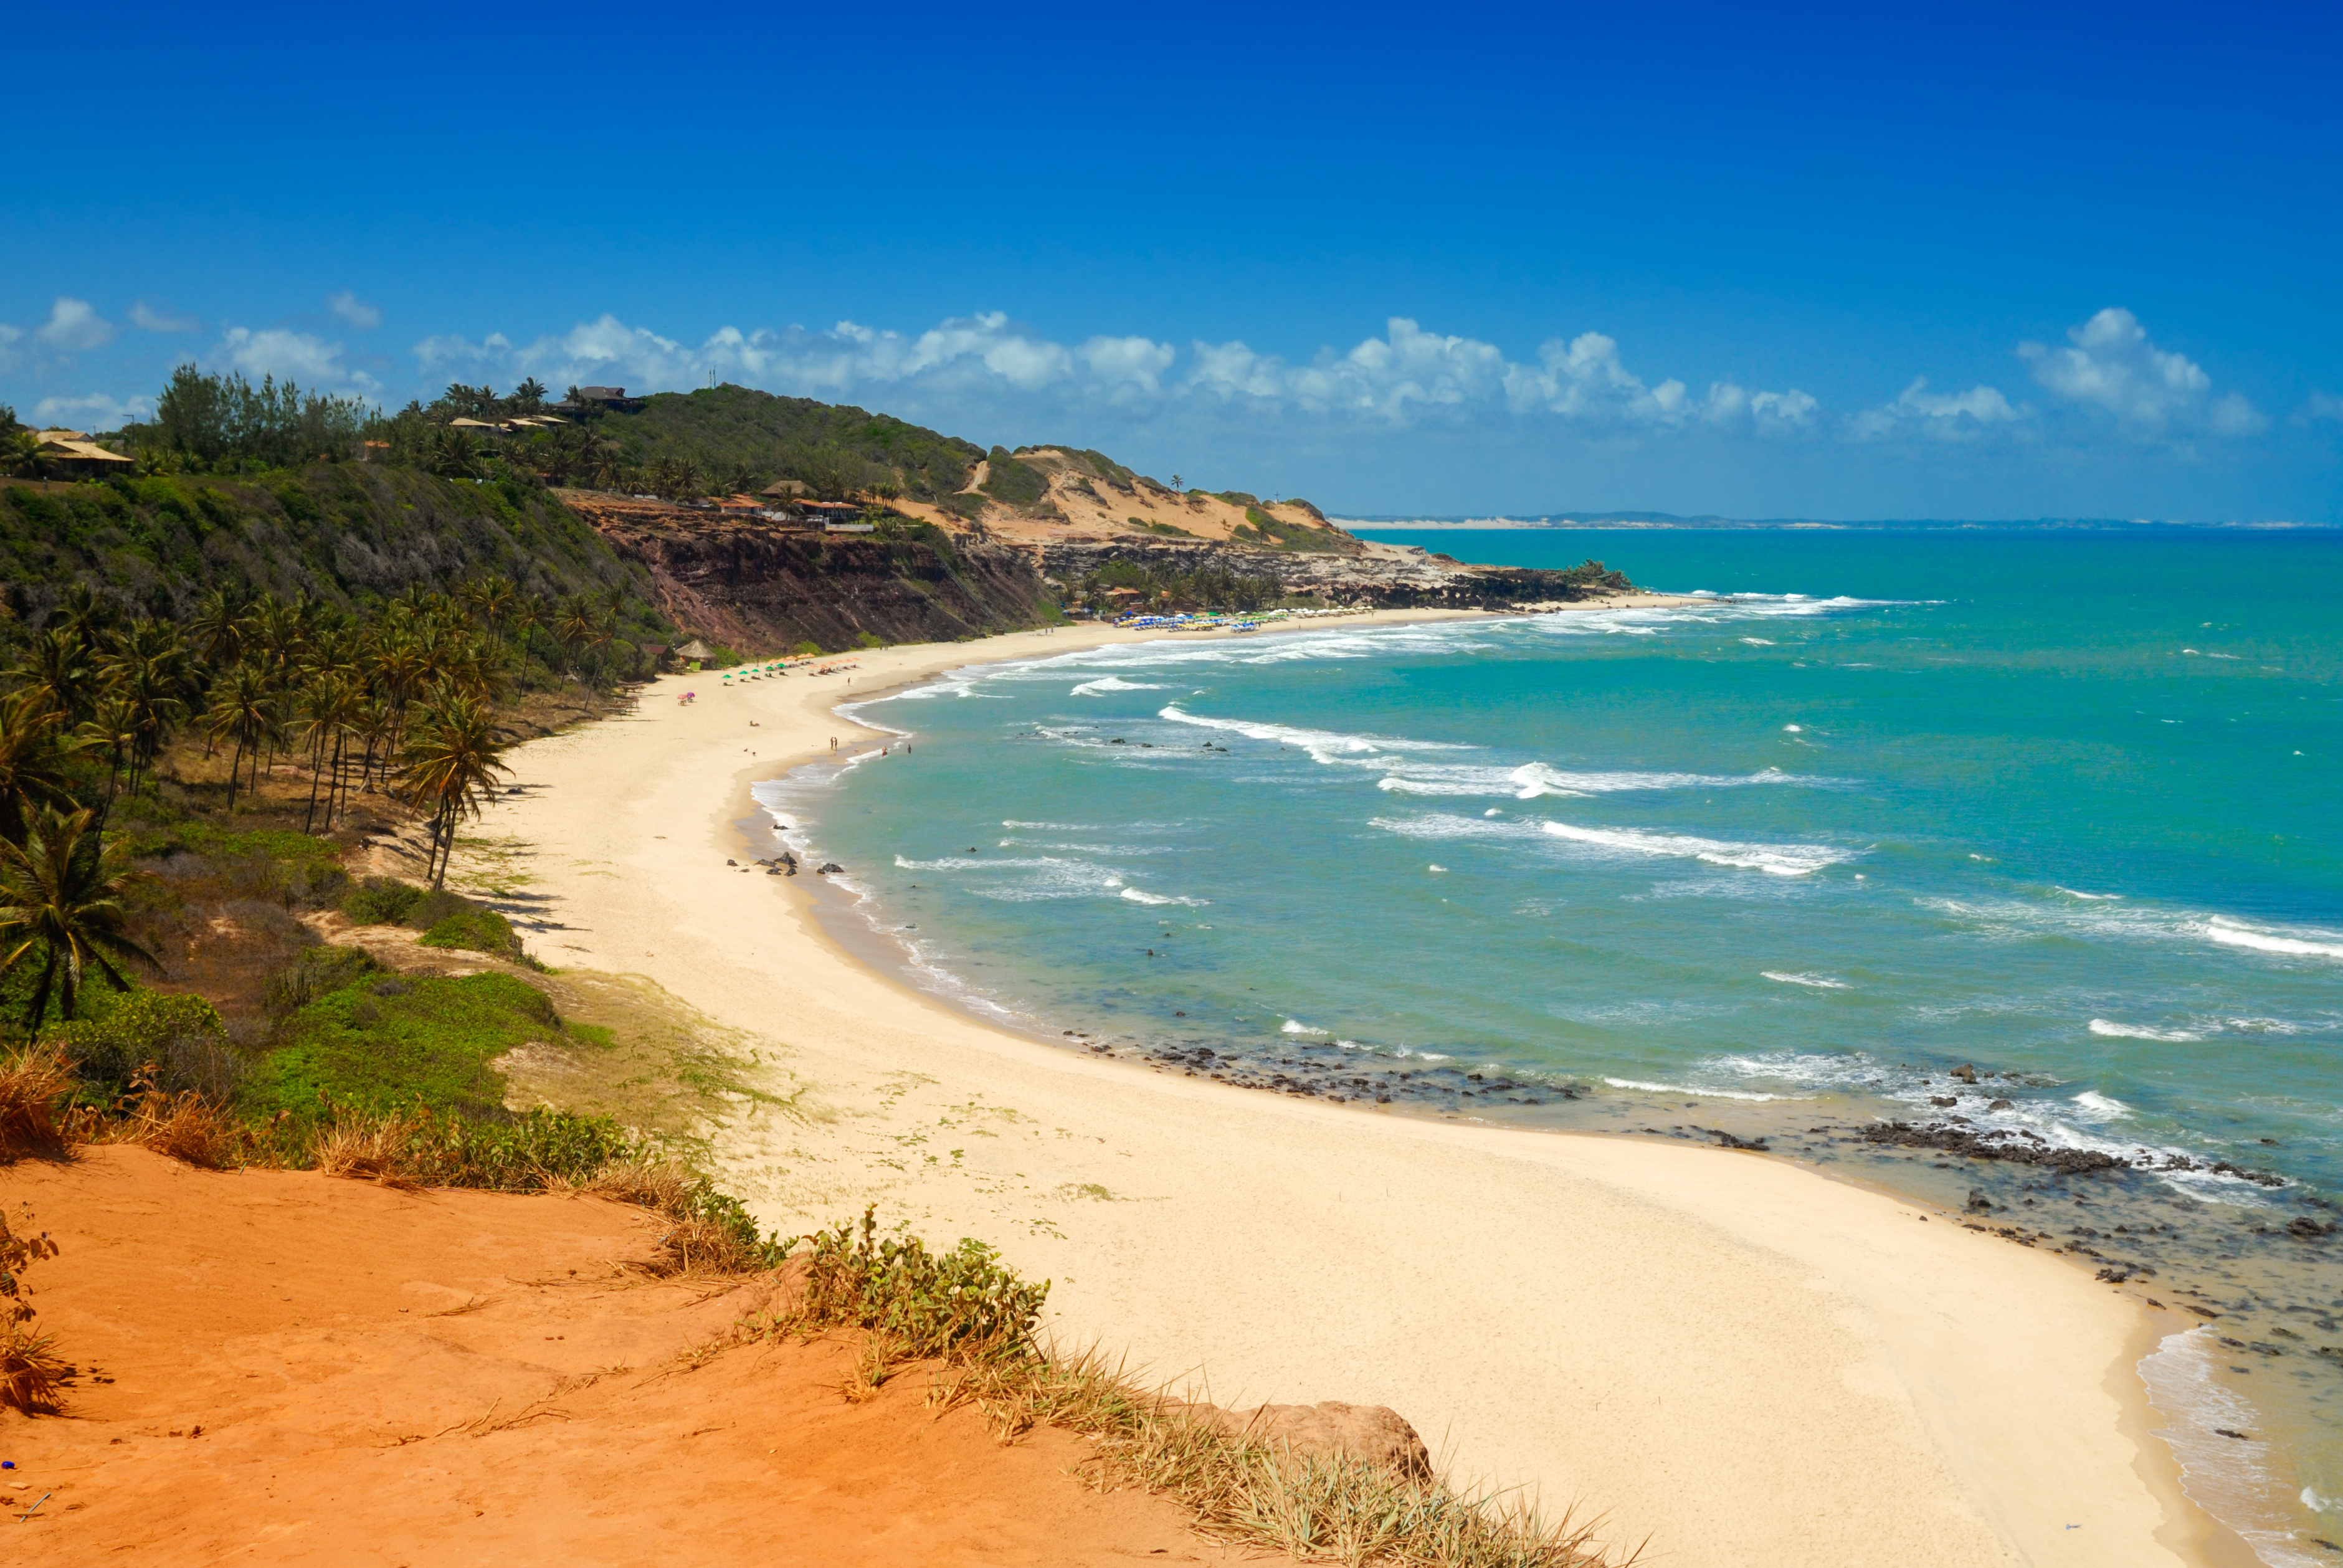 Praia da Pipa